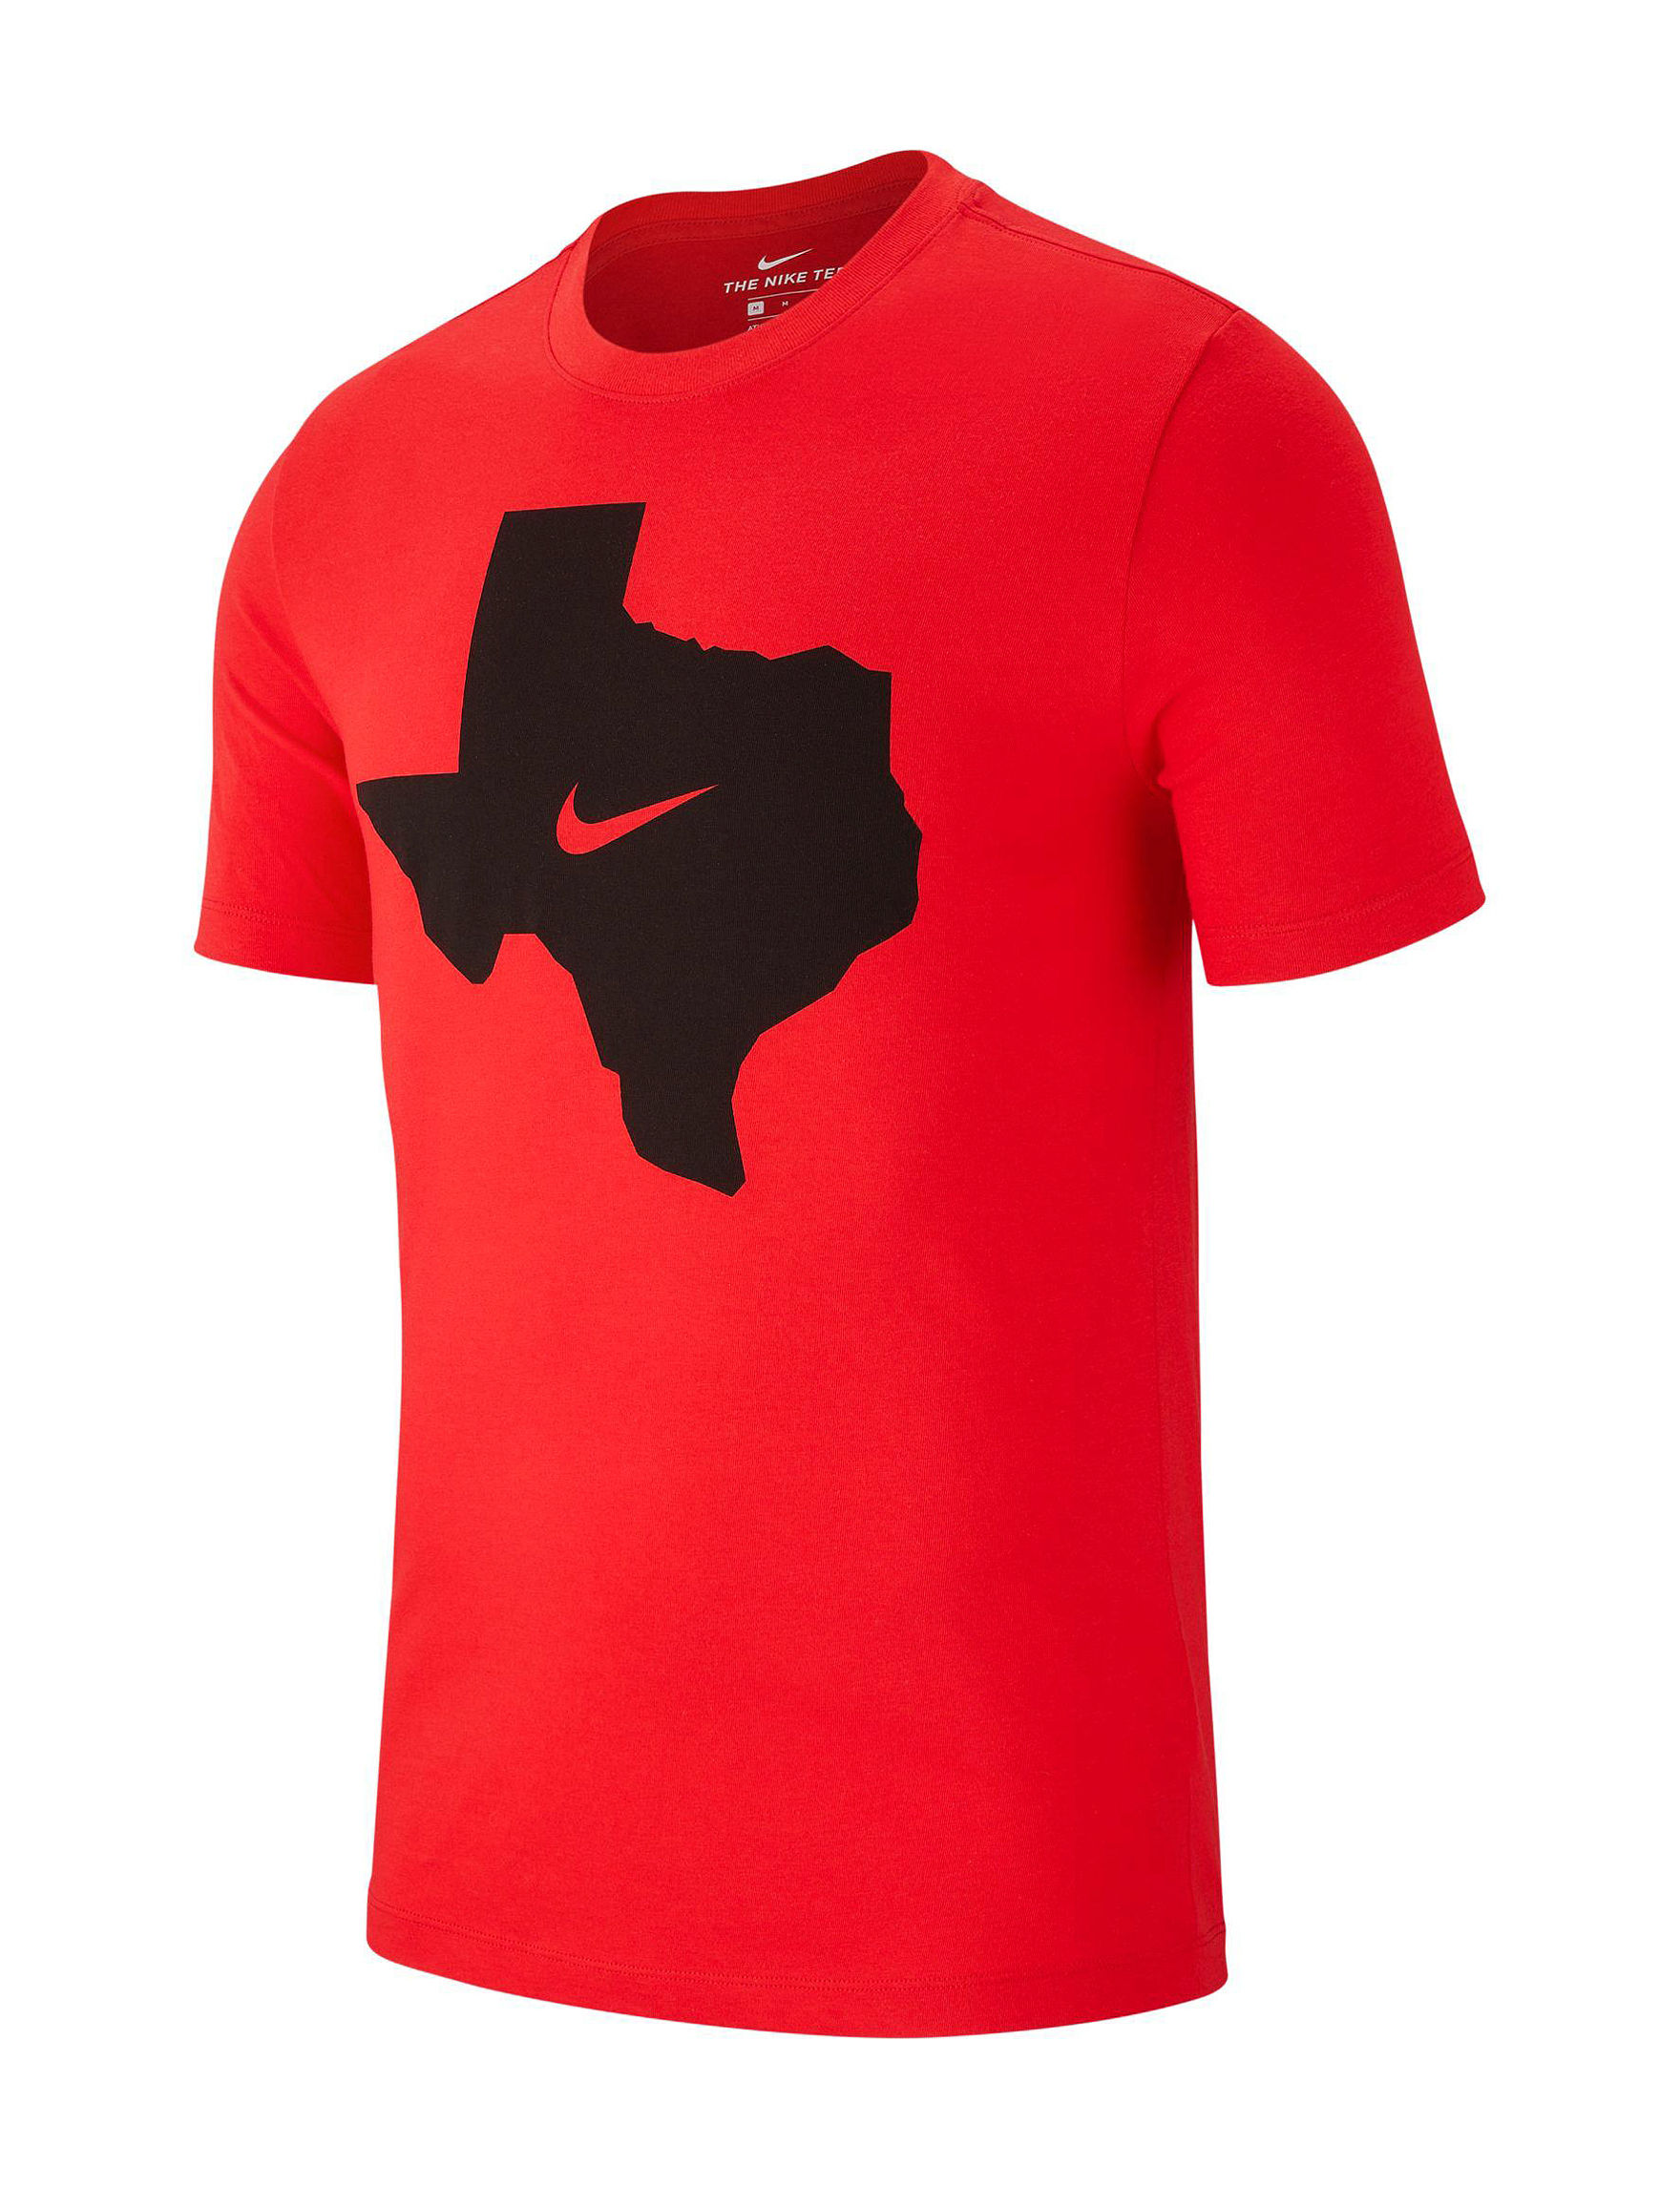 Nike Red / Black Tees & Tanks